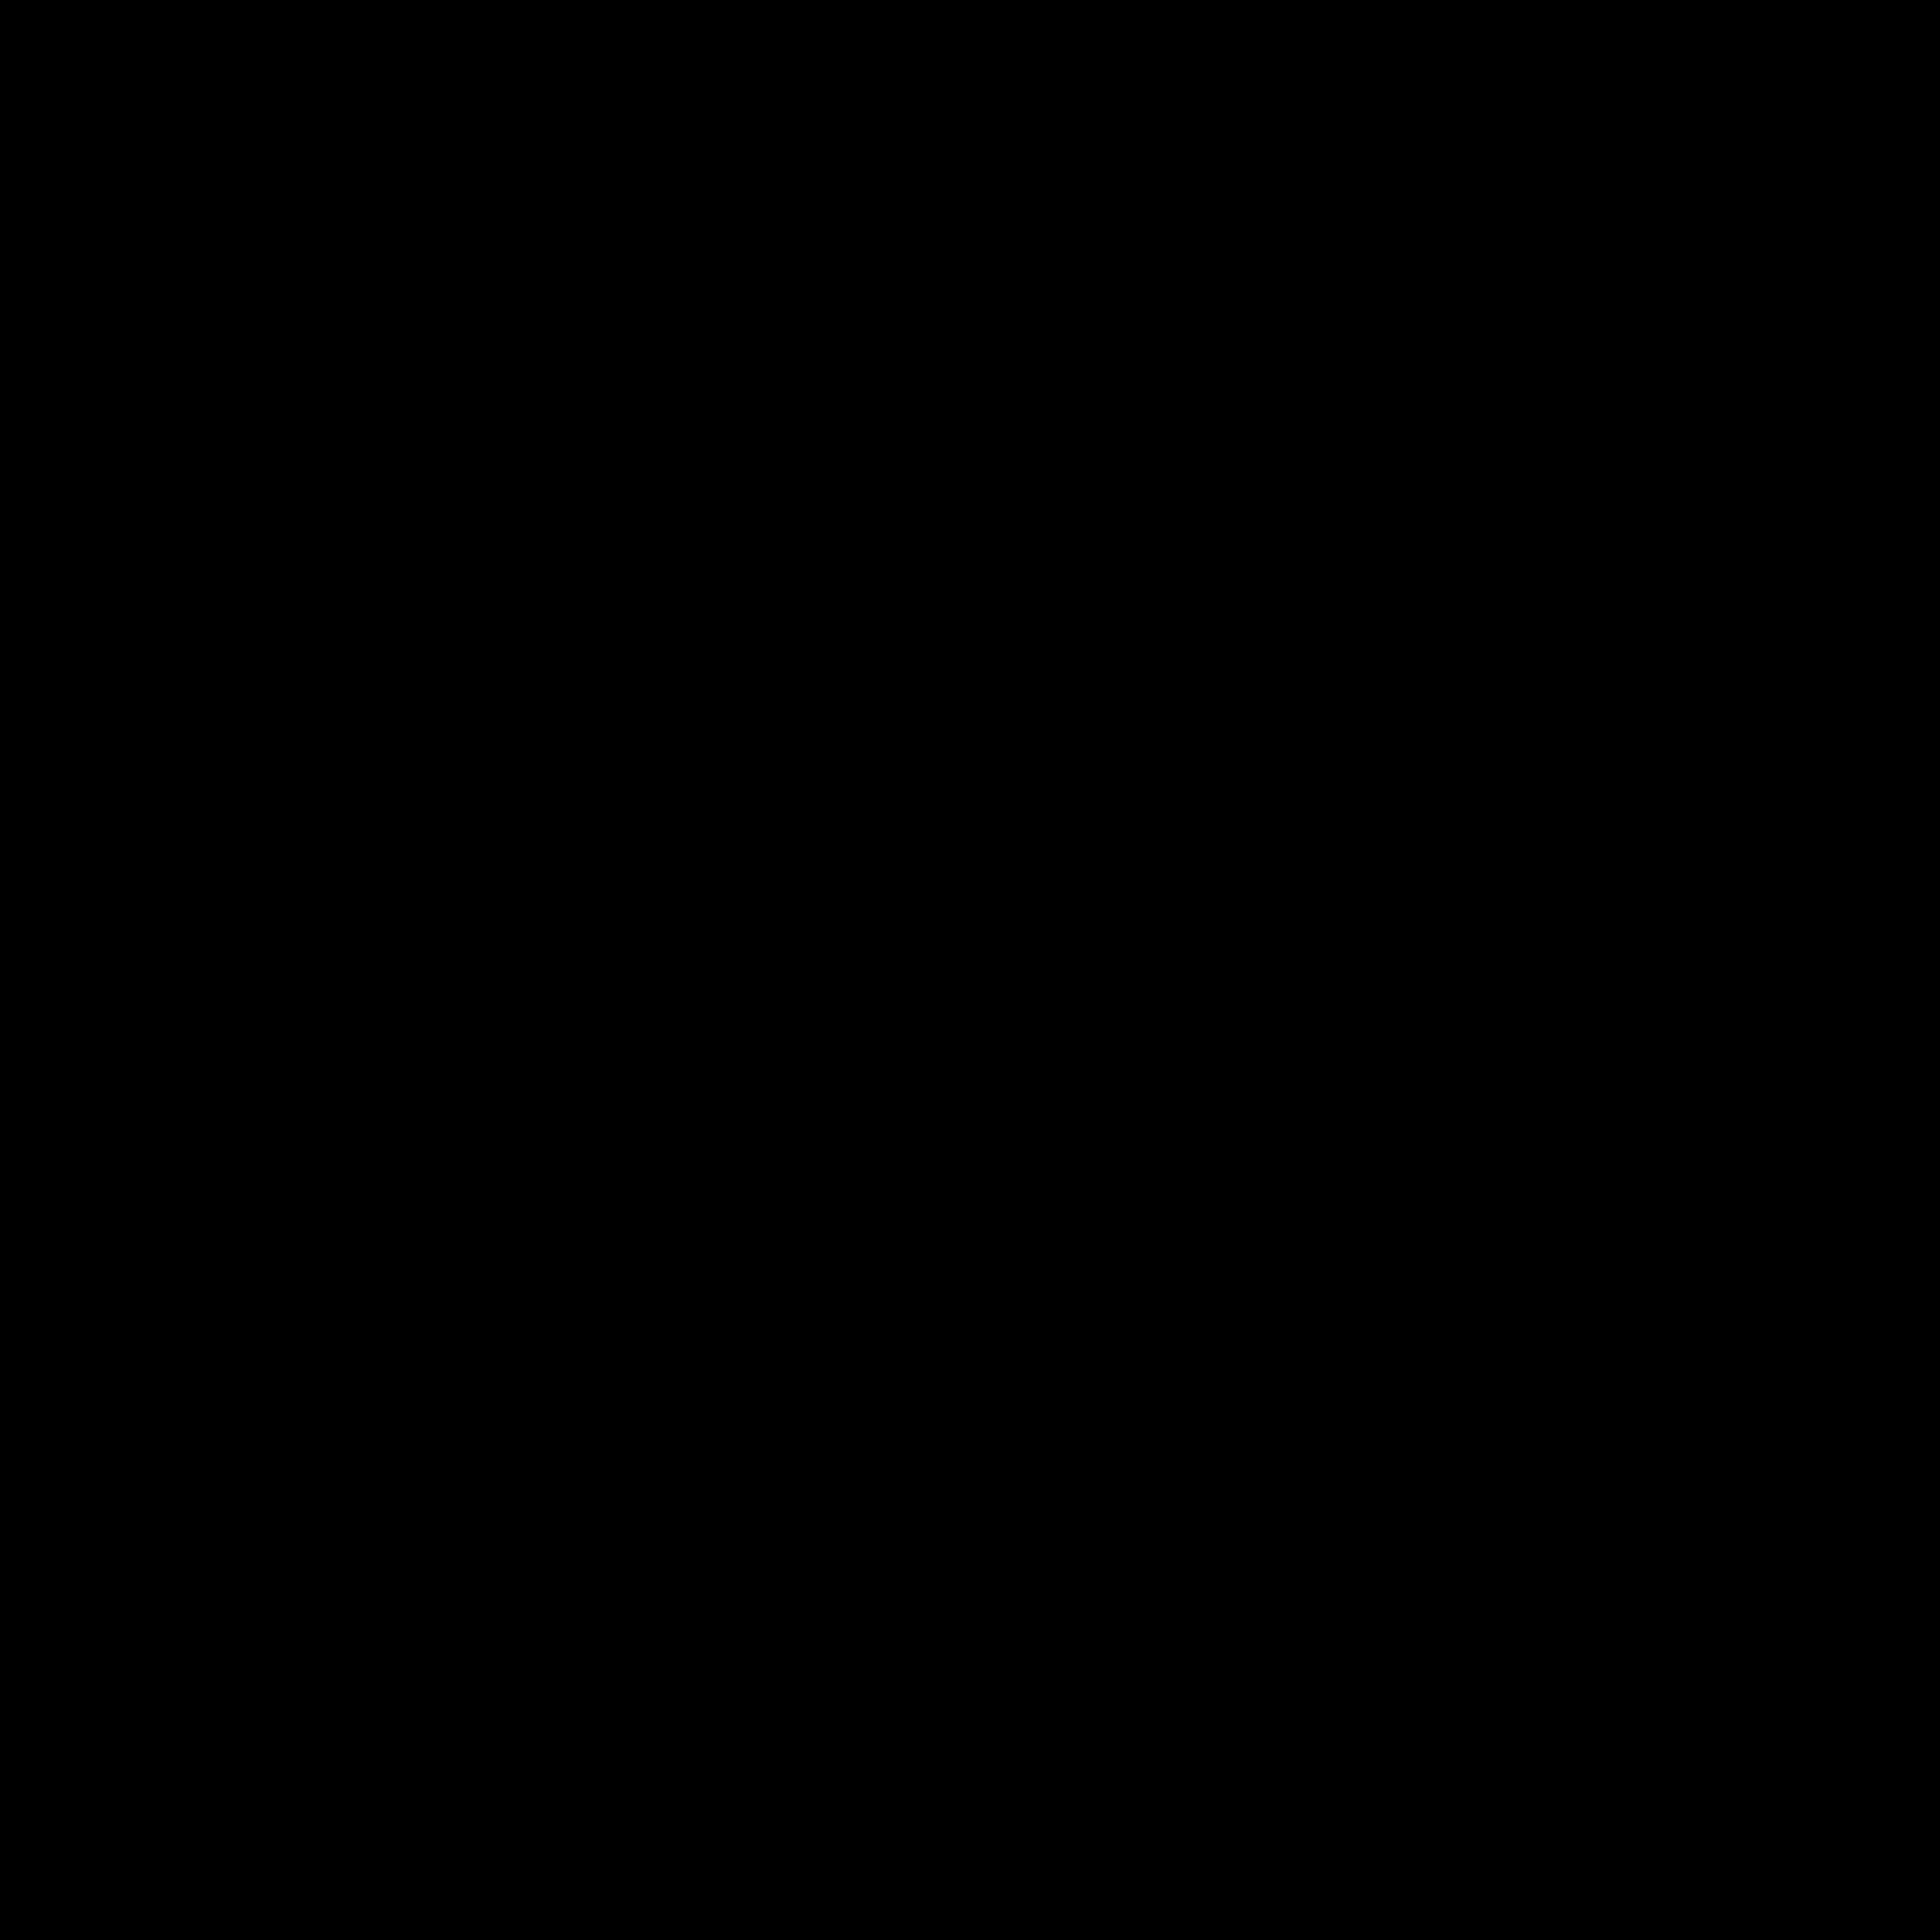 mary-kay-1-logo-png-transparent